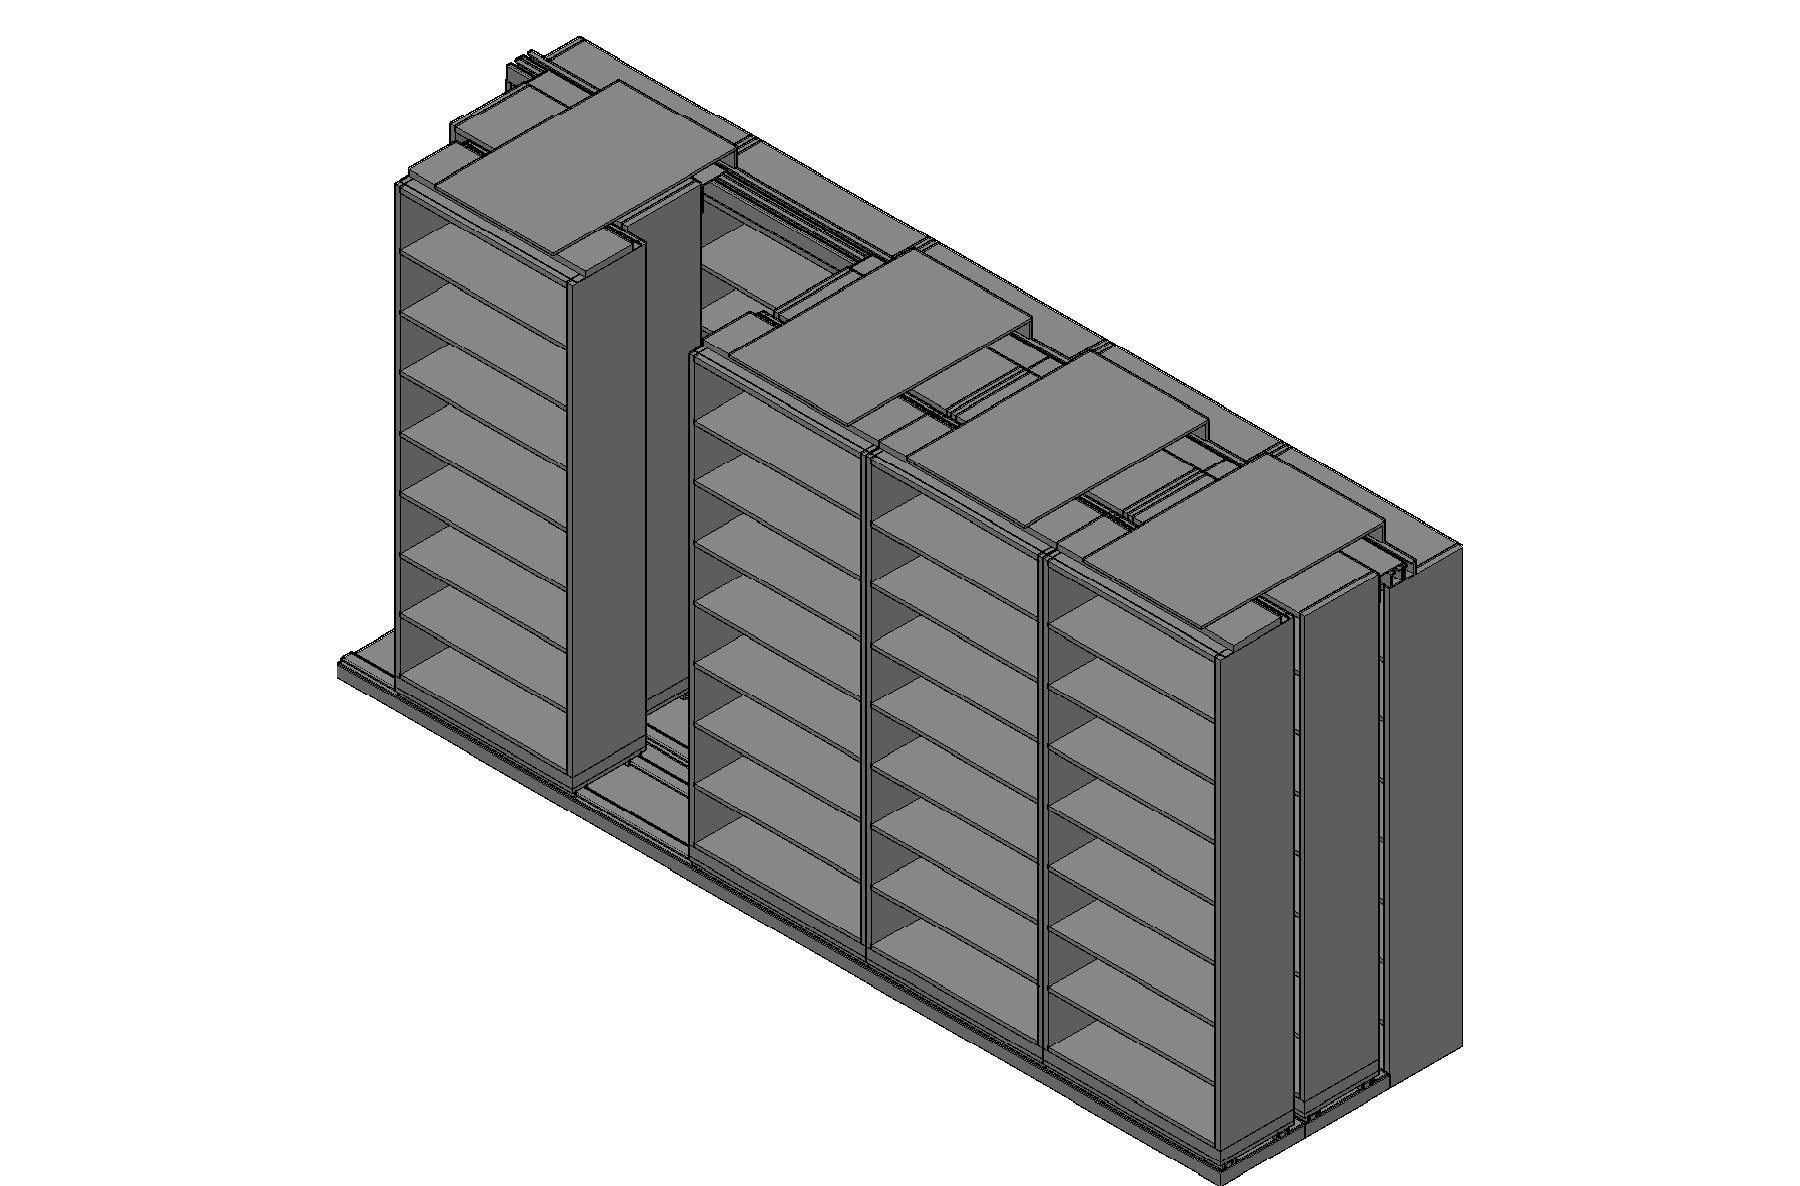 "Legal Size Sliding Shelves - 3 Rows Deep - 8 Levels - (36"" x 15"" Shelves) - 184"" Total Width"